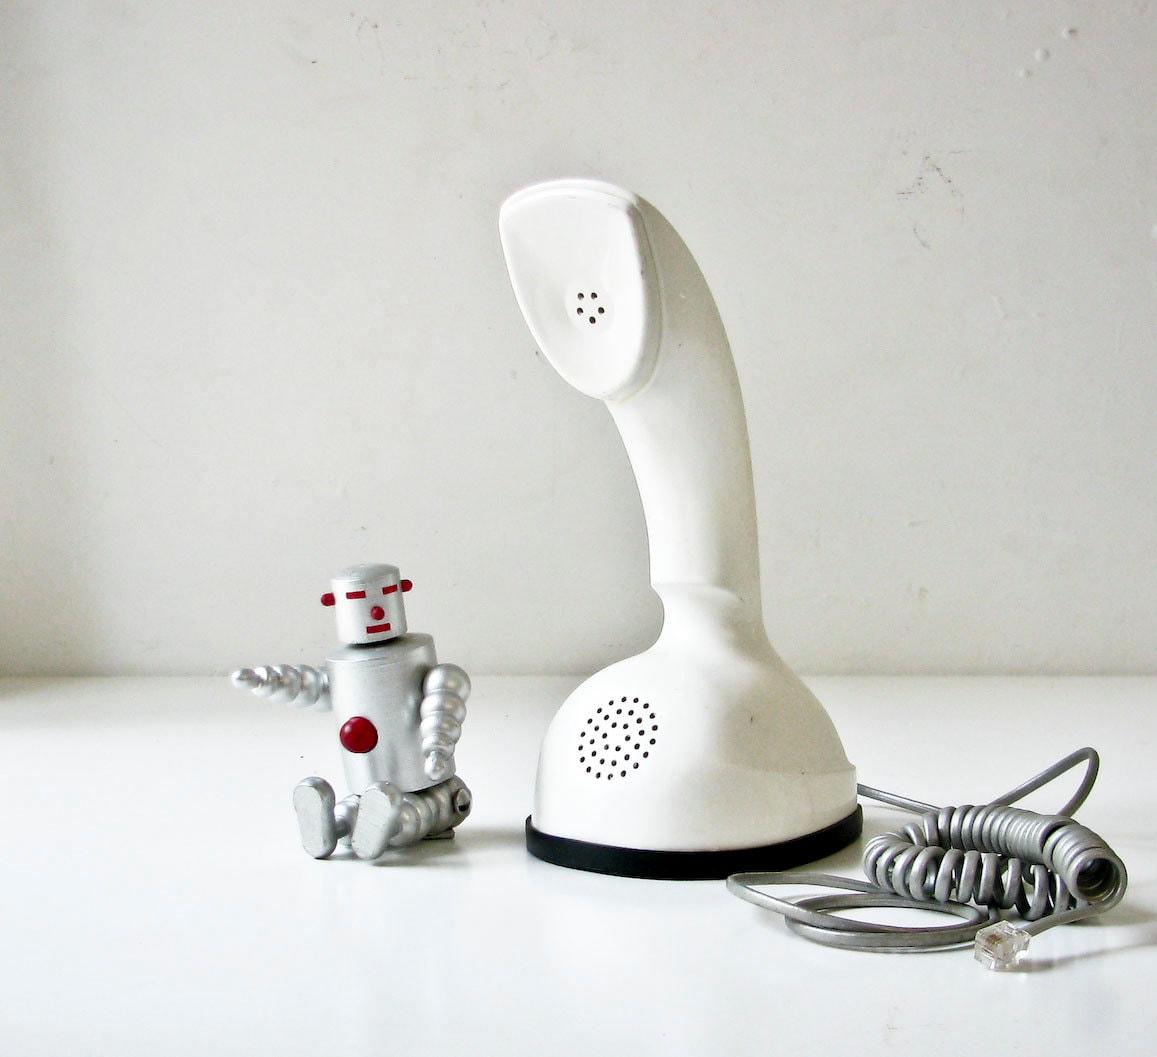 Mid Century Modern White Phone - BeeJayKay